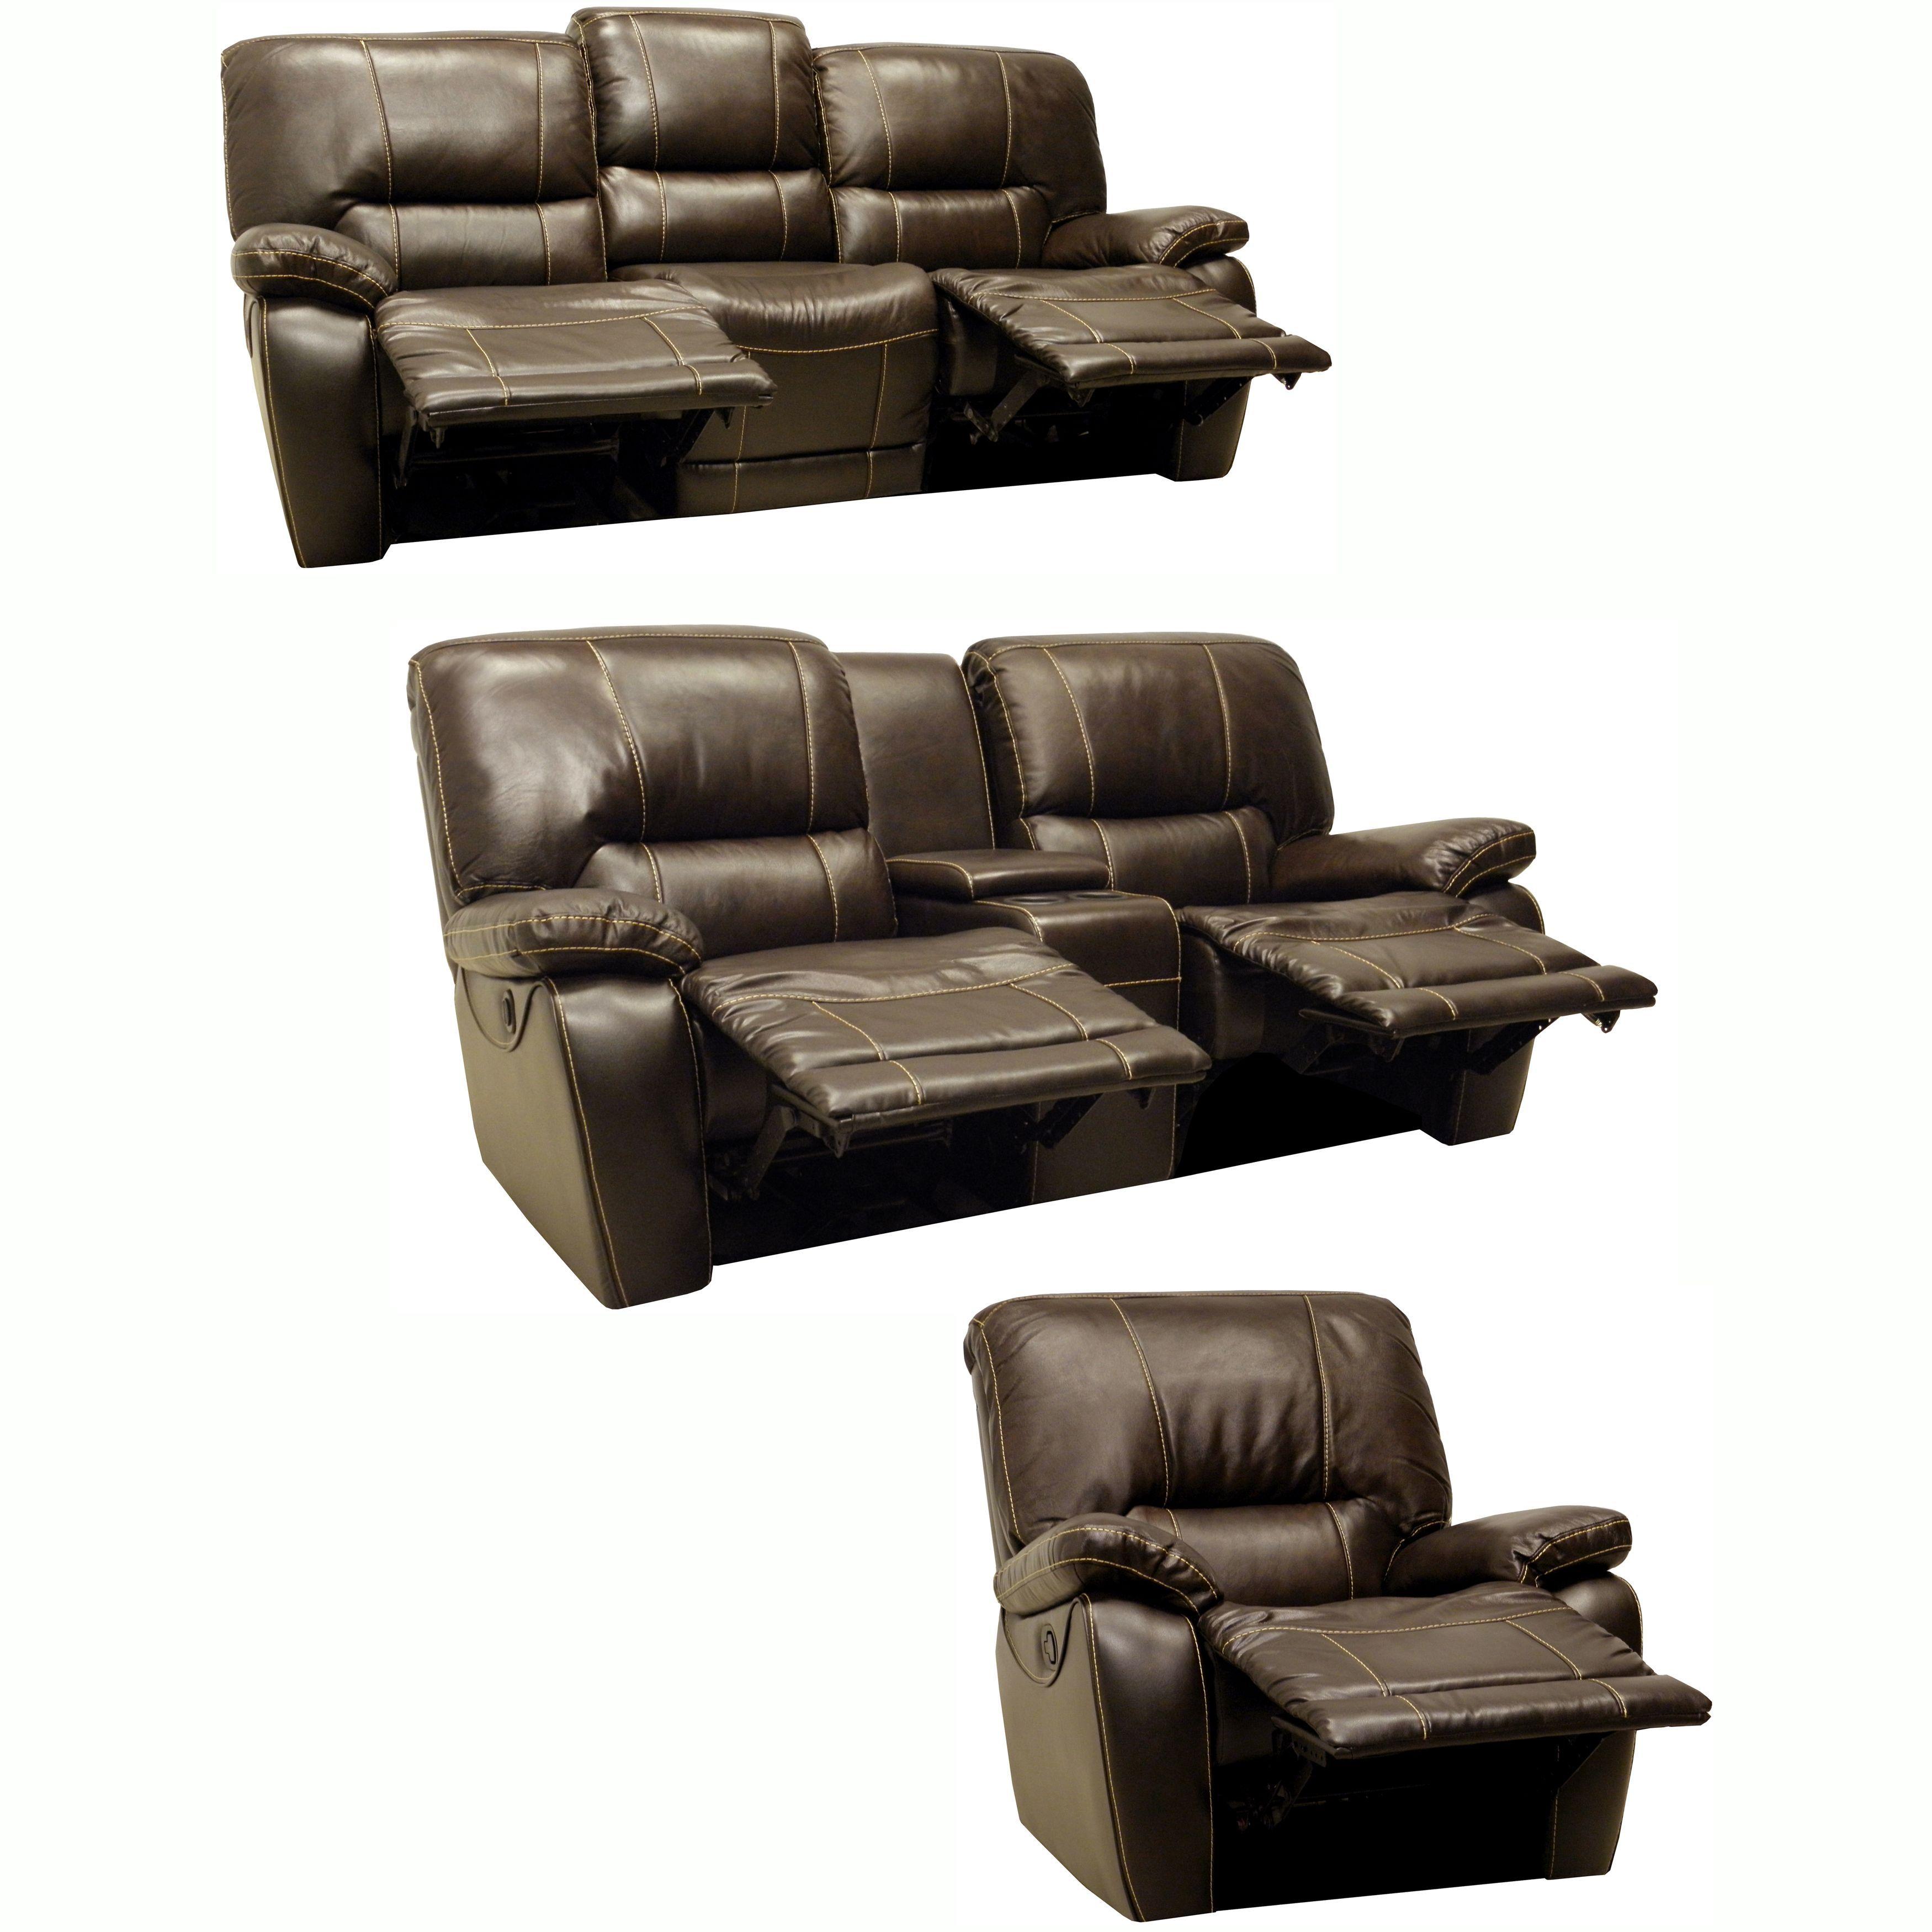 The Walton Dark Brown Italian Leather Motorized Reclining Sofa Loveseat And Glider